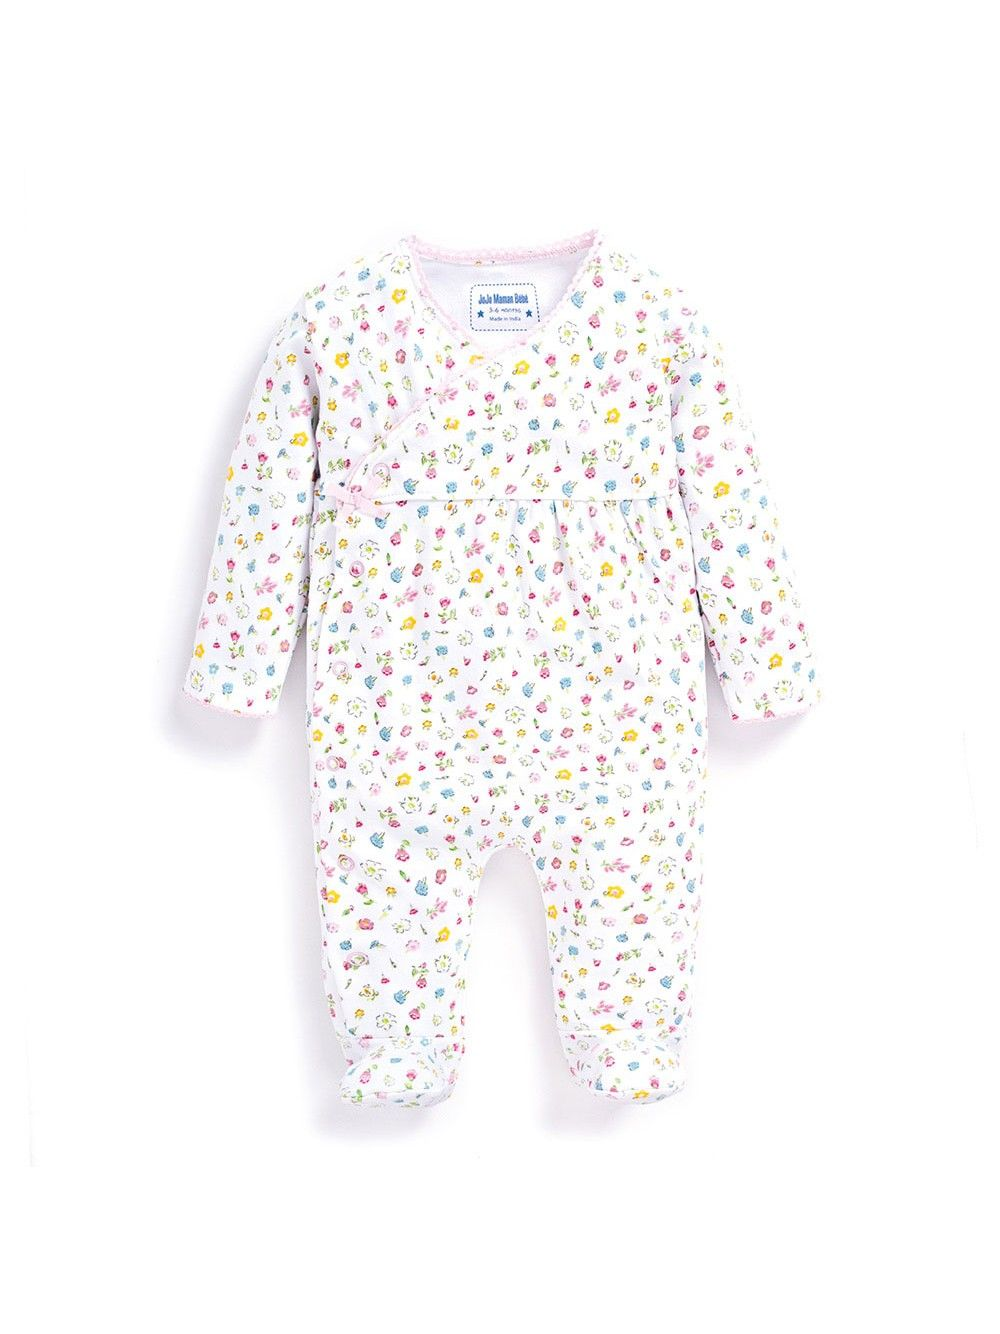 fe3717c7d Pretty Floral Baby Sleepsuit